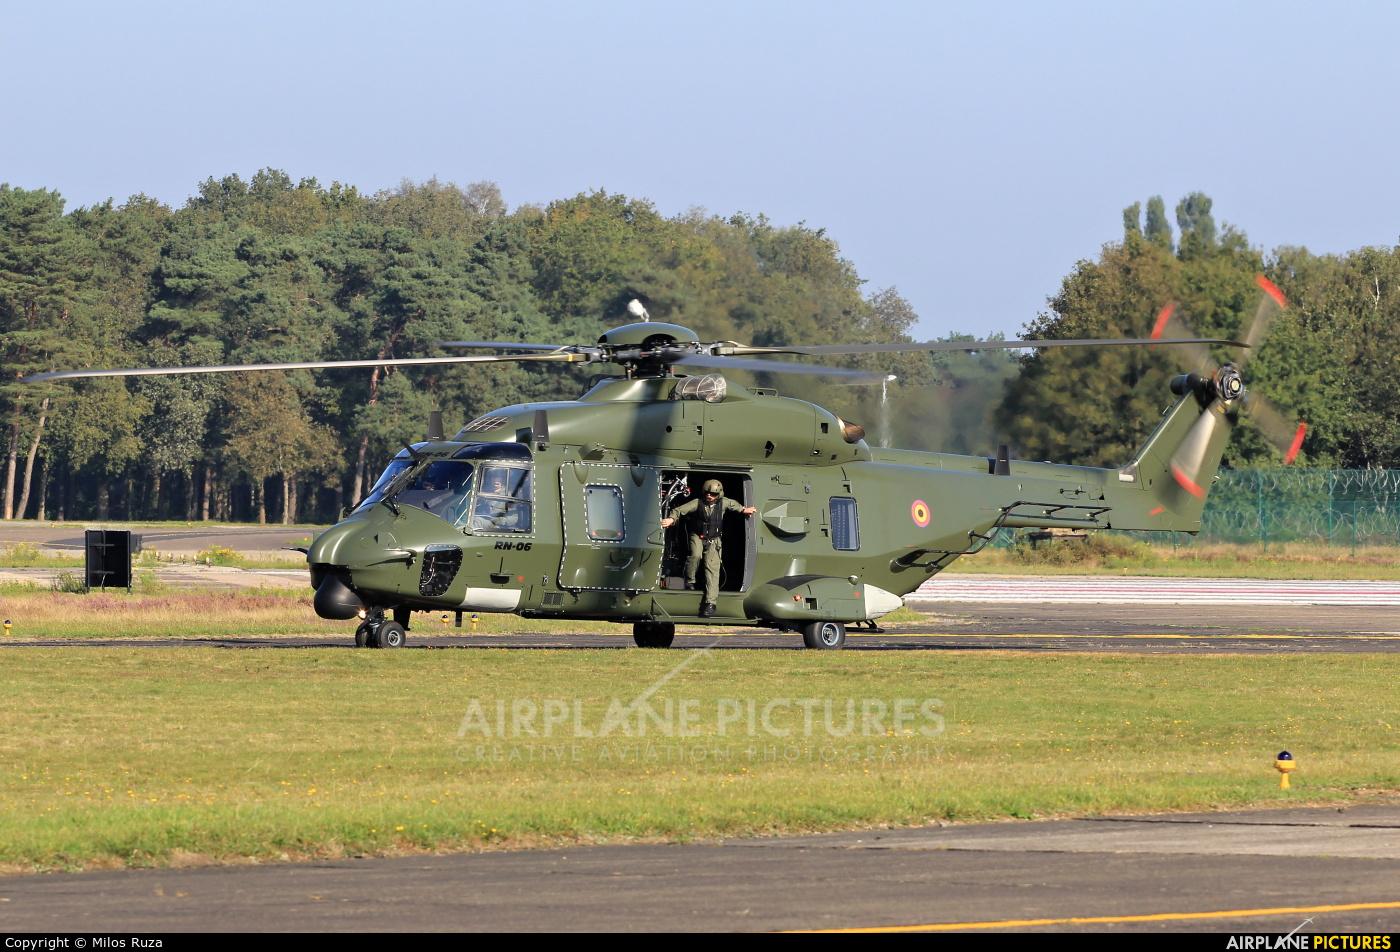 Belgium - Air Force RN-06 aircraft at Kleine Brogel